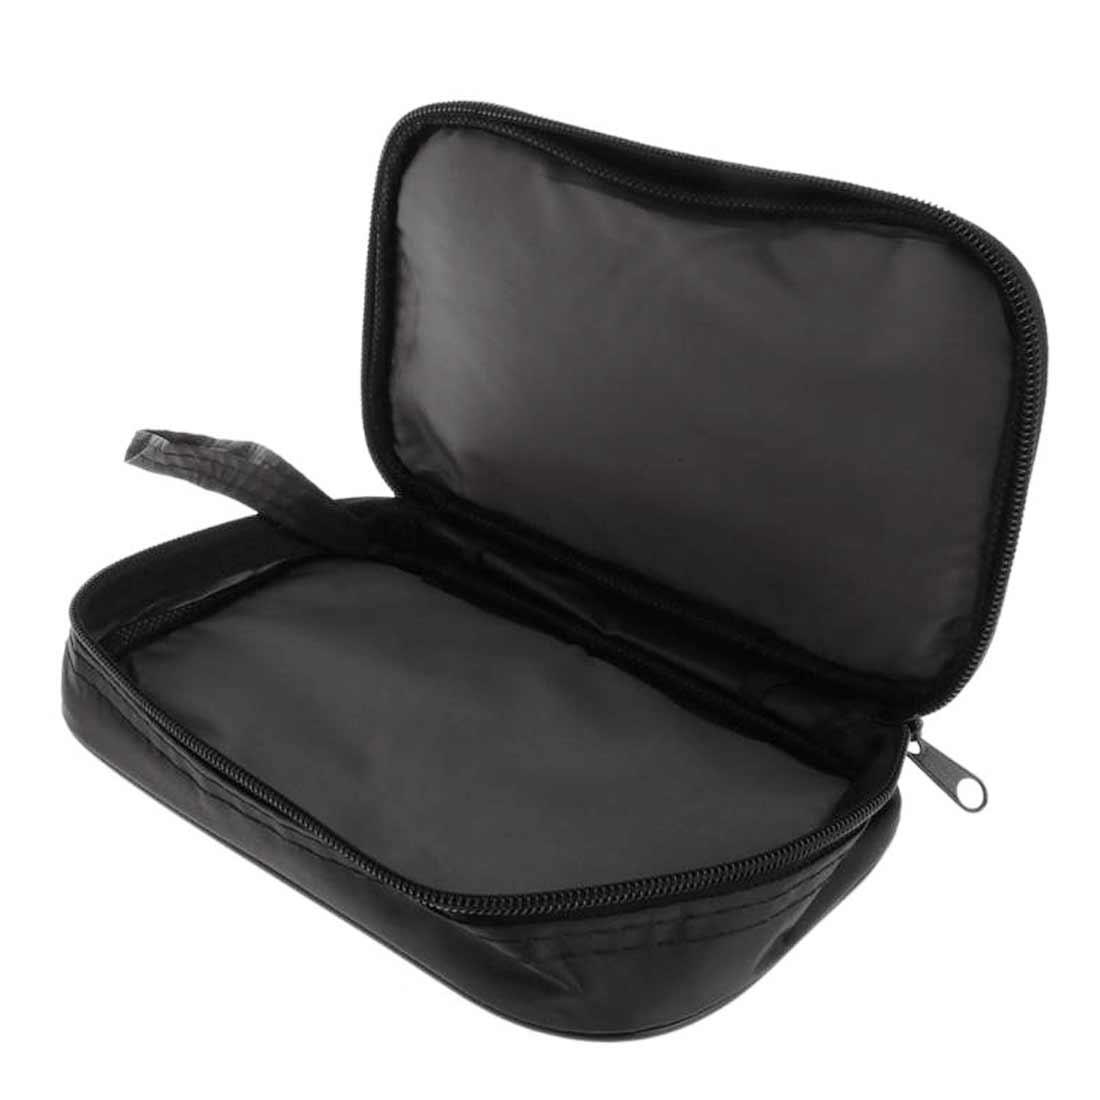 23x14x5cm Multimeter Black Colth Bag Durable Waterproof Shockproof Soft Case Tool Bag